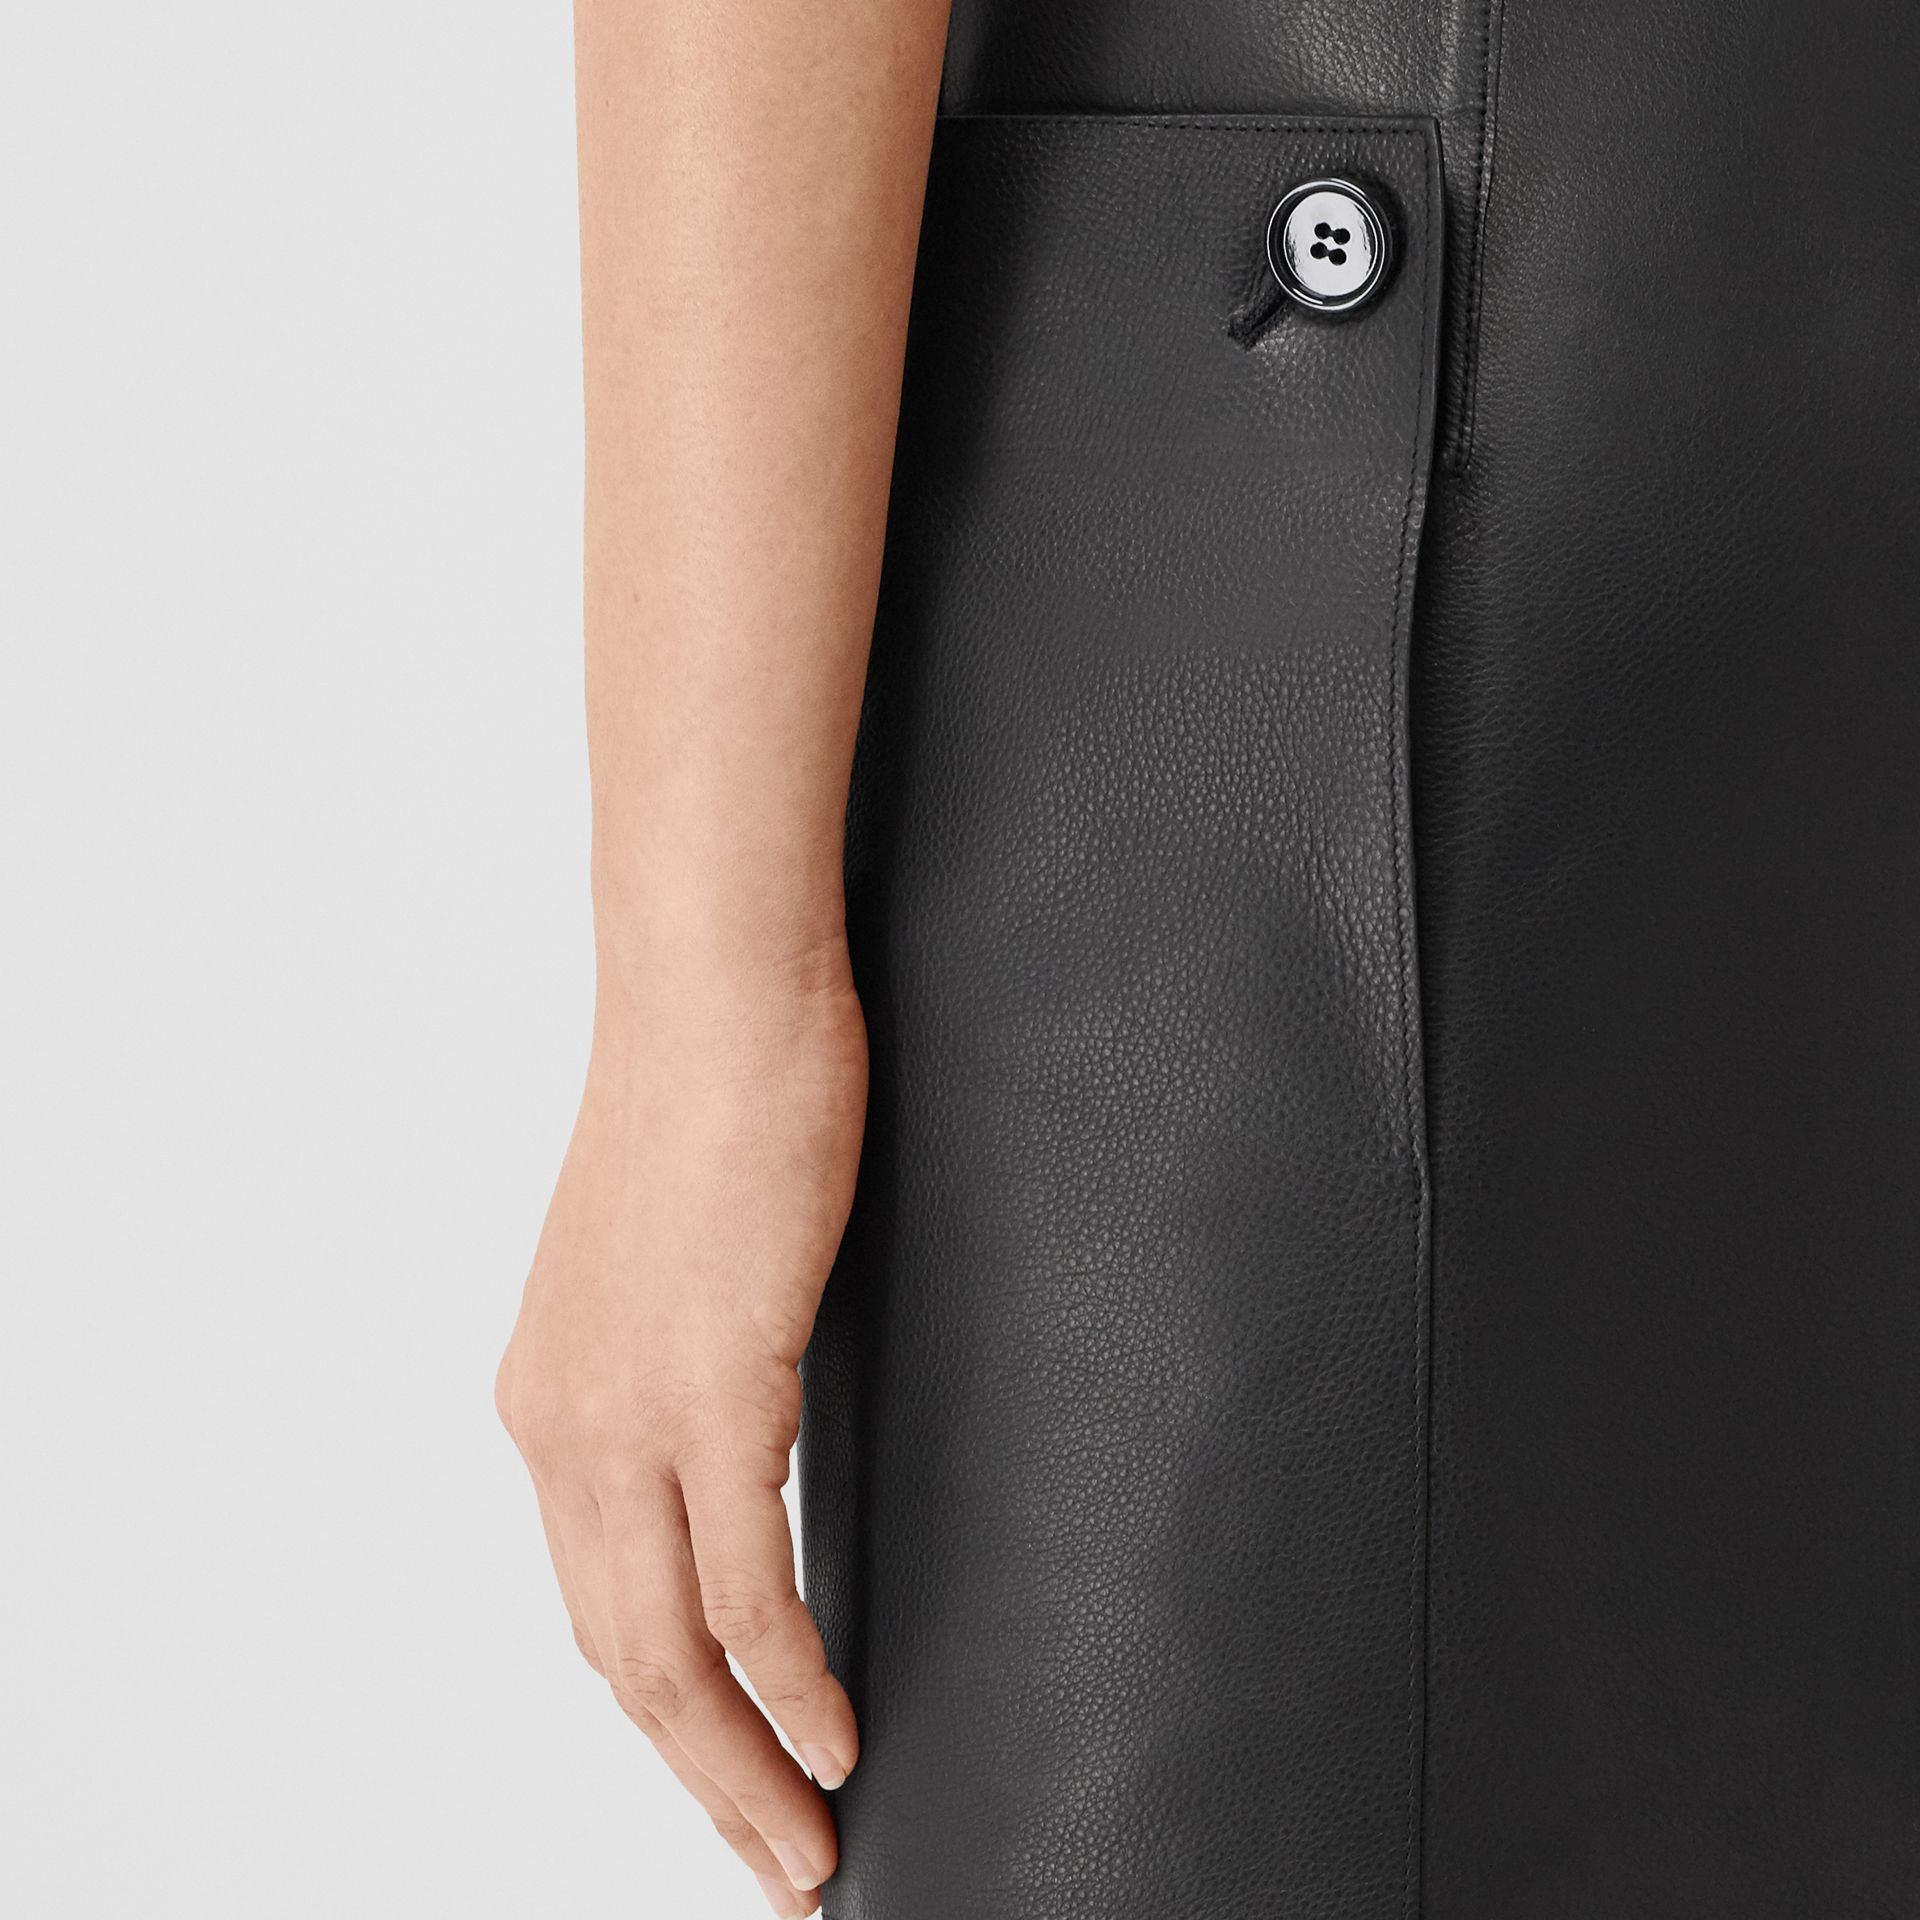 Eyelet Detail Leather Sleeveless Dress in Black - Women | Burberry - gallery image 5